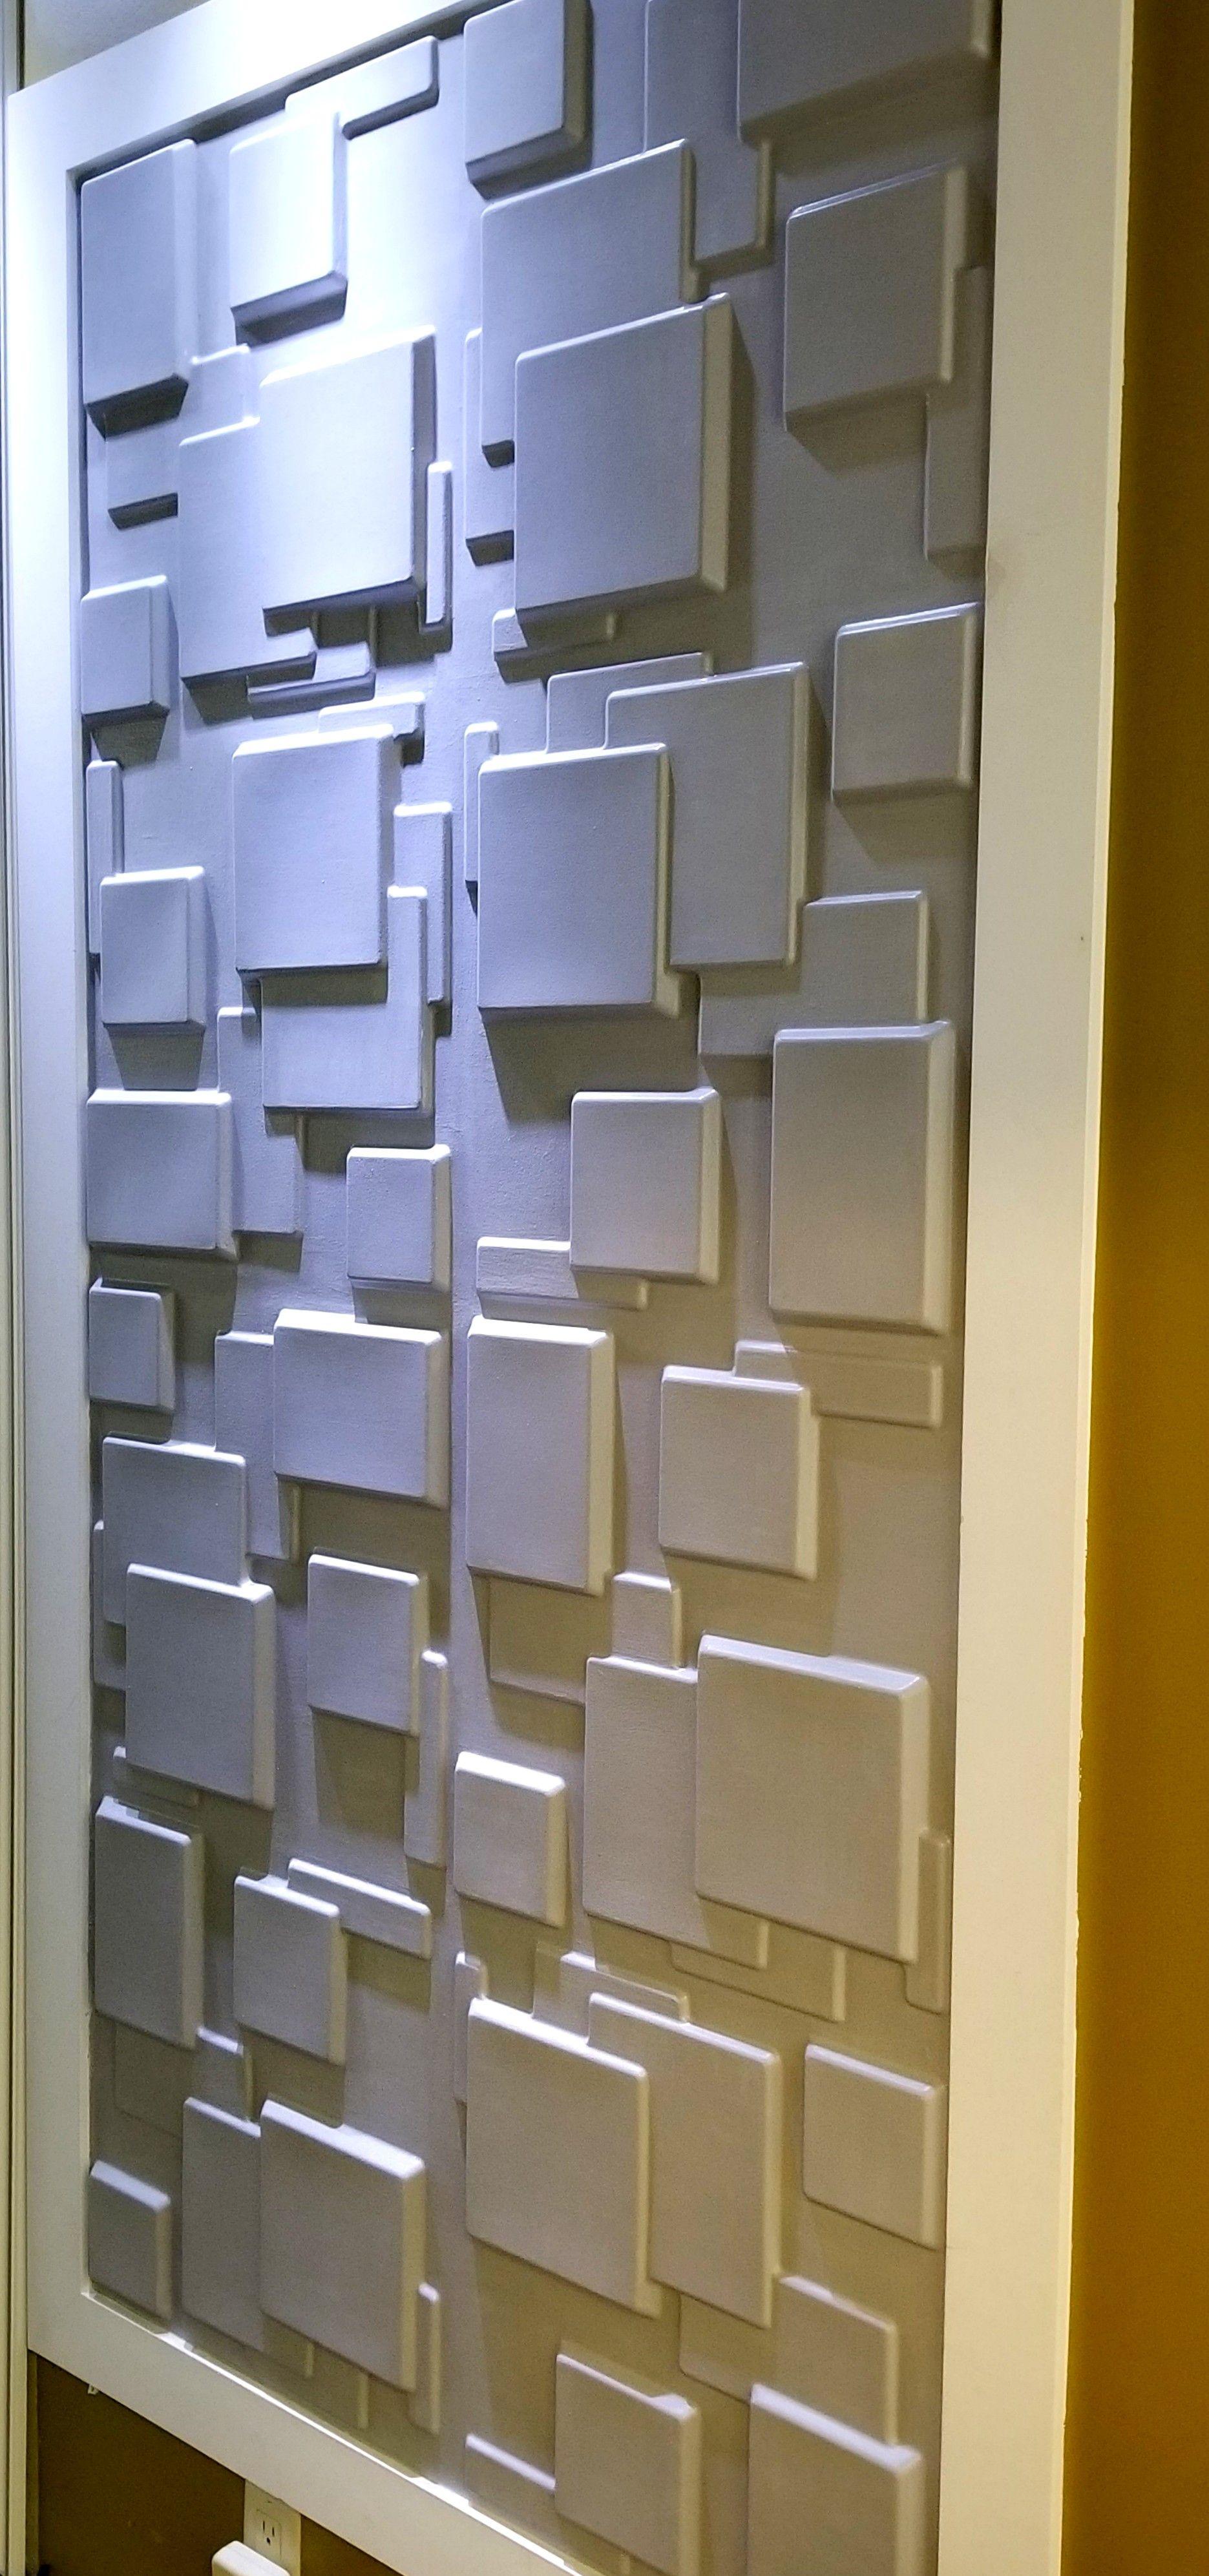 Apart Design Bank.3d 55 Wall Panels Box Of 24 Panels 3d Wall Design Ideas Wall